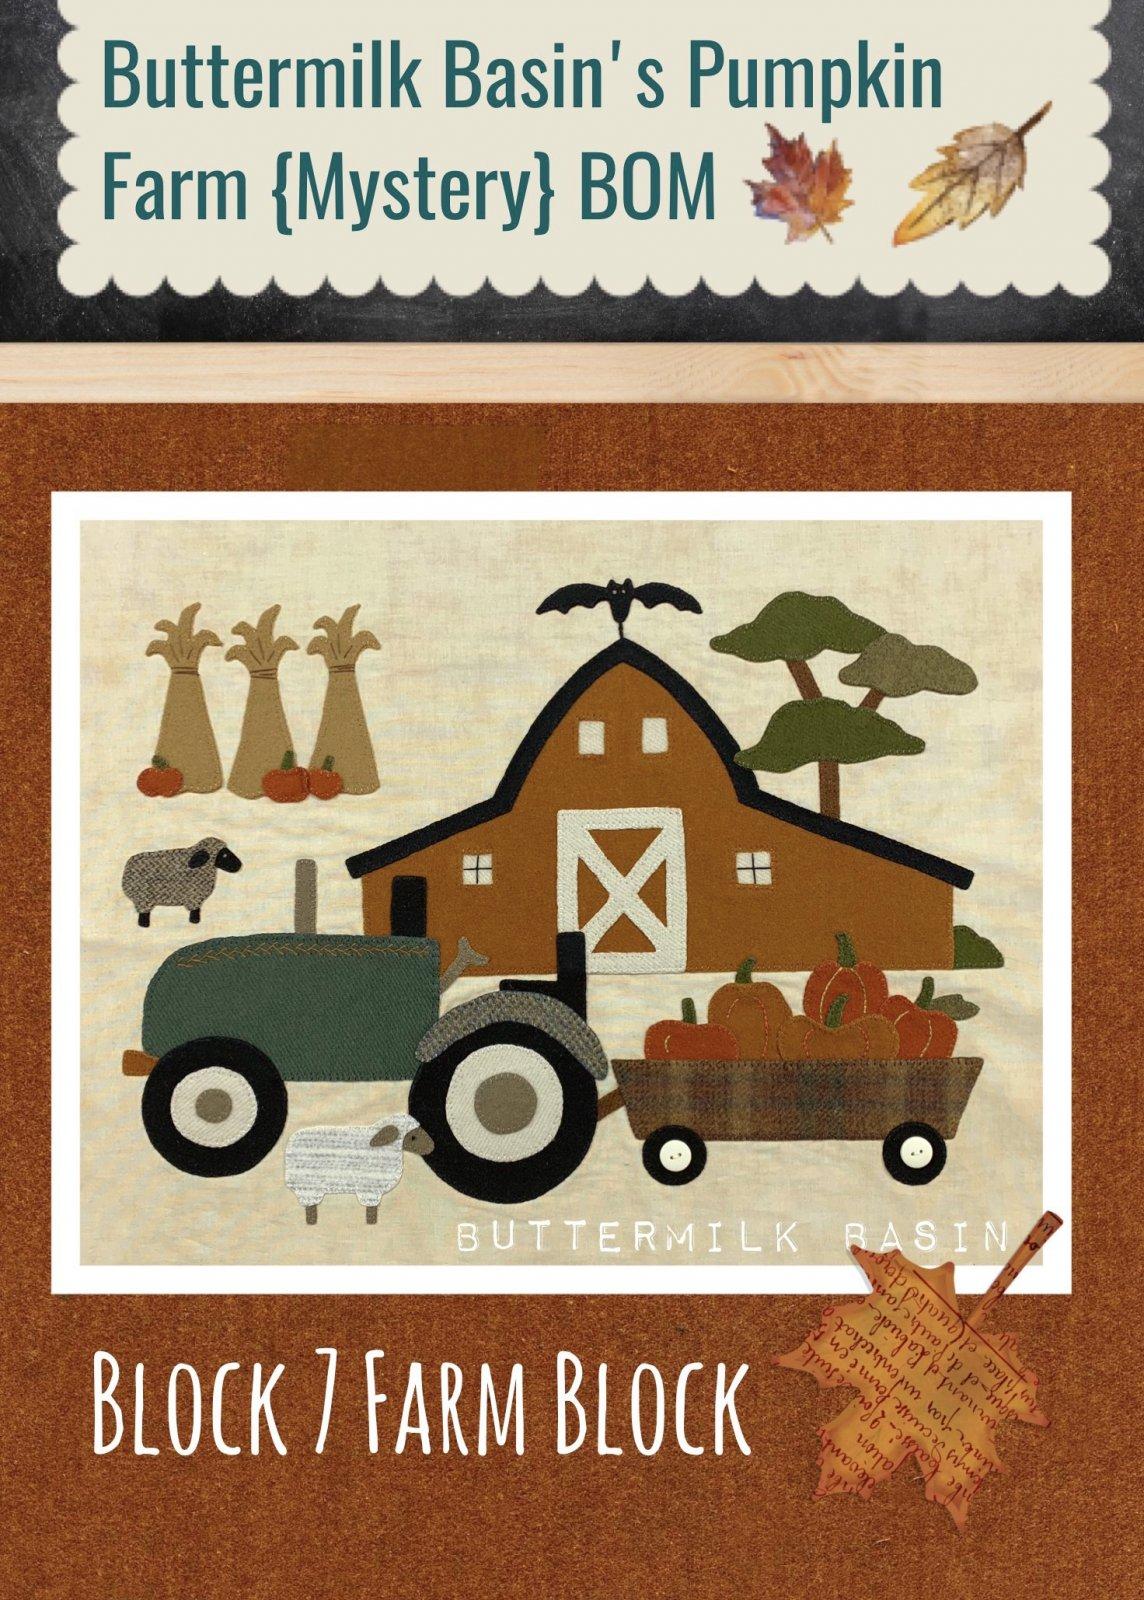 Buttermilk Basin's Pumpkin Farm {Mystery} BOM, Block 7 Kit and Pattern